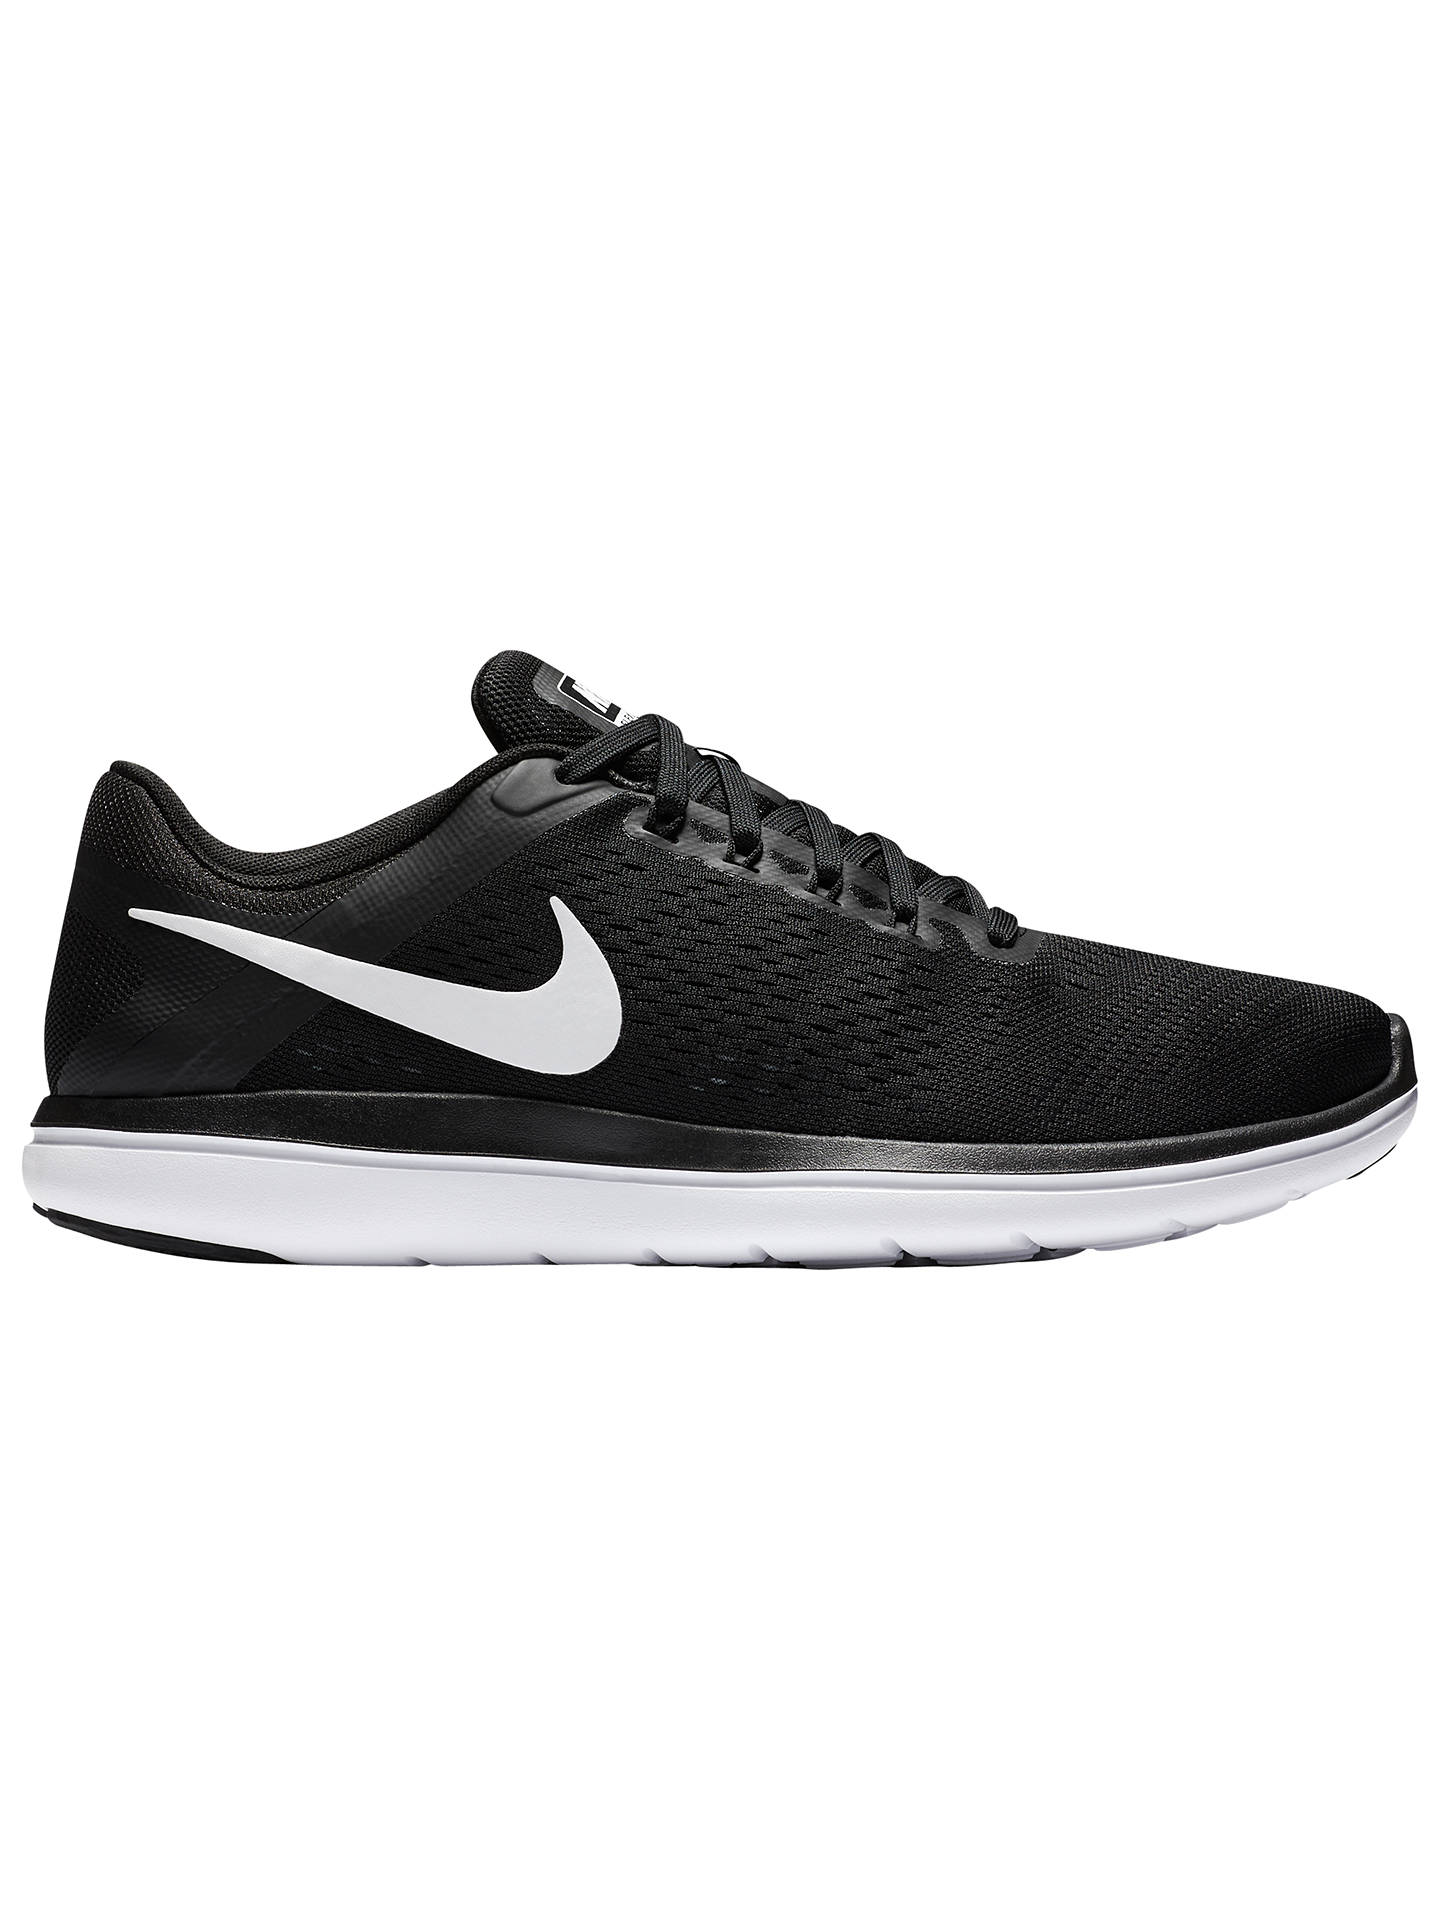 BuyNike Flex 2016 RN Men s Running Shoes 0371f6c298c1